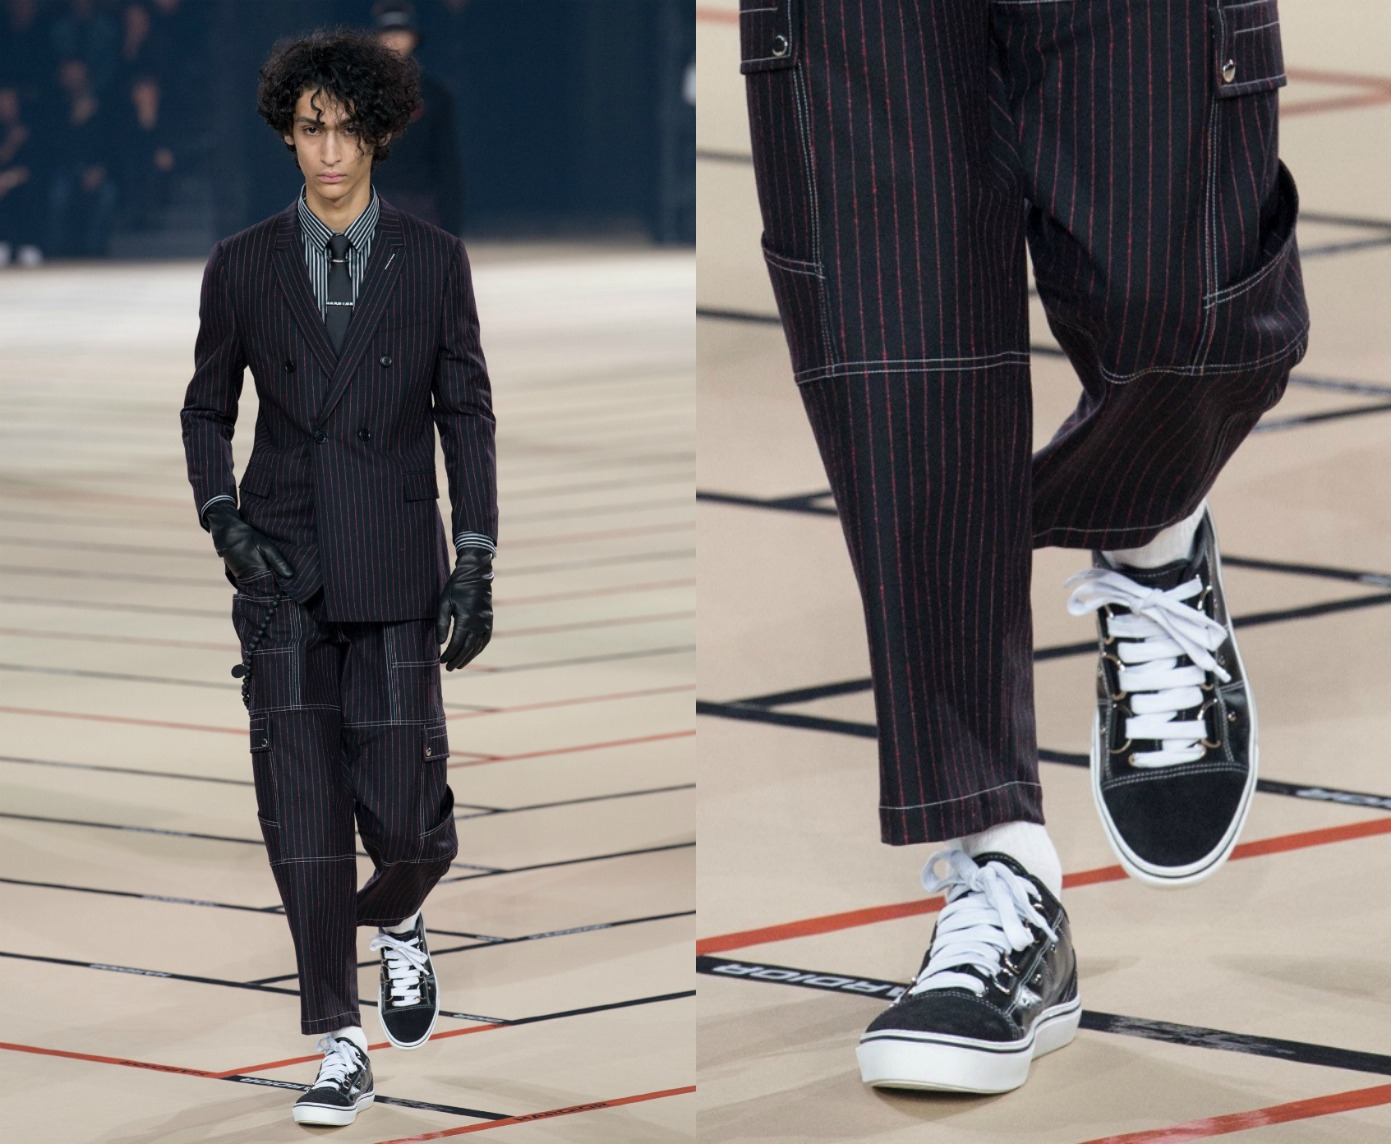 Dior Homme 2017 F/W(疑似向 Vans Old Skool 致敬的)球鞋